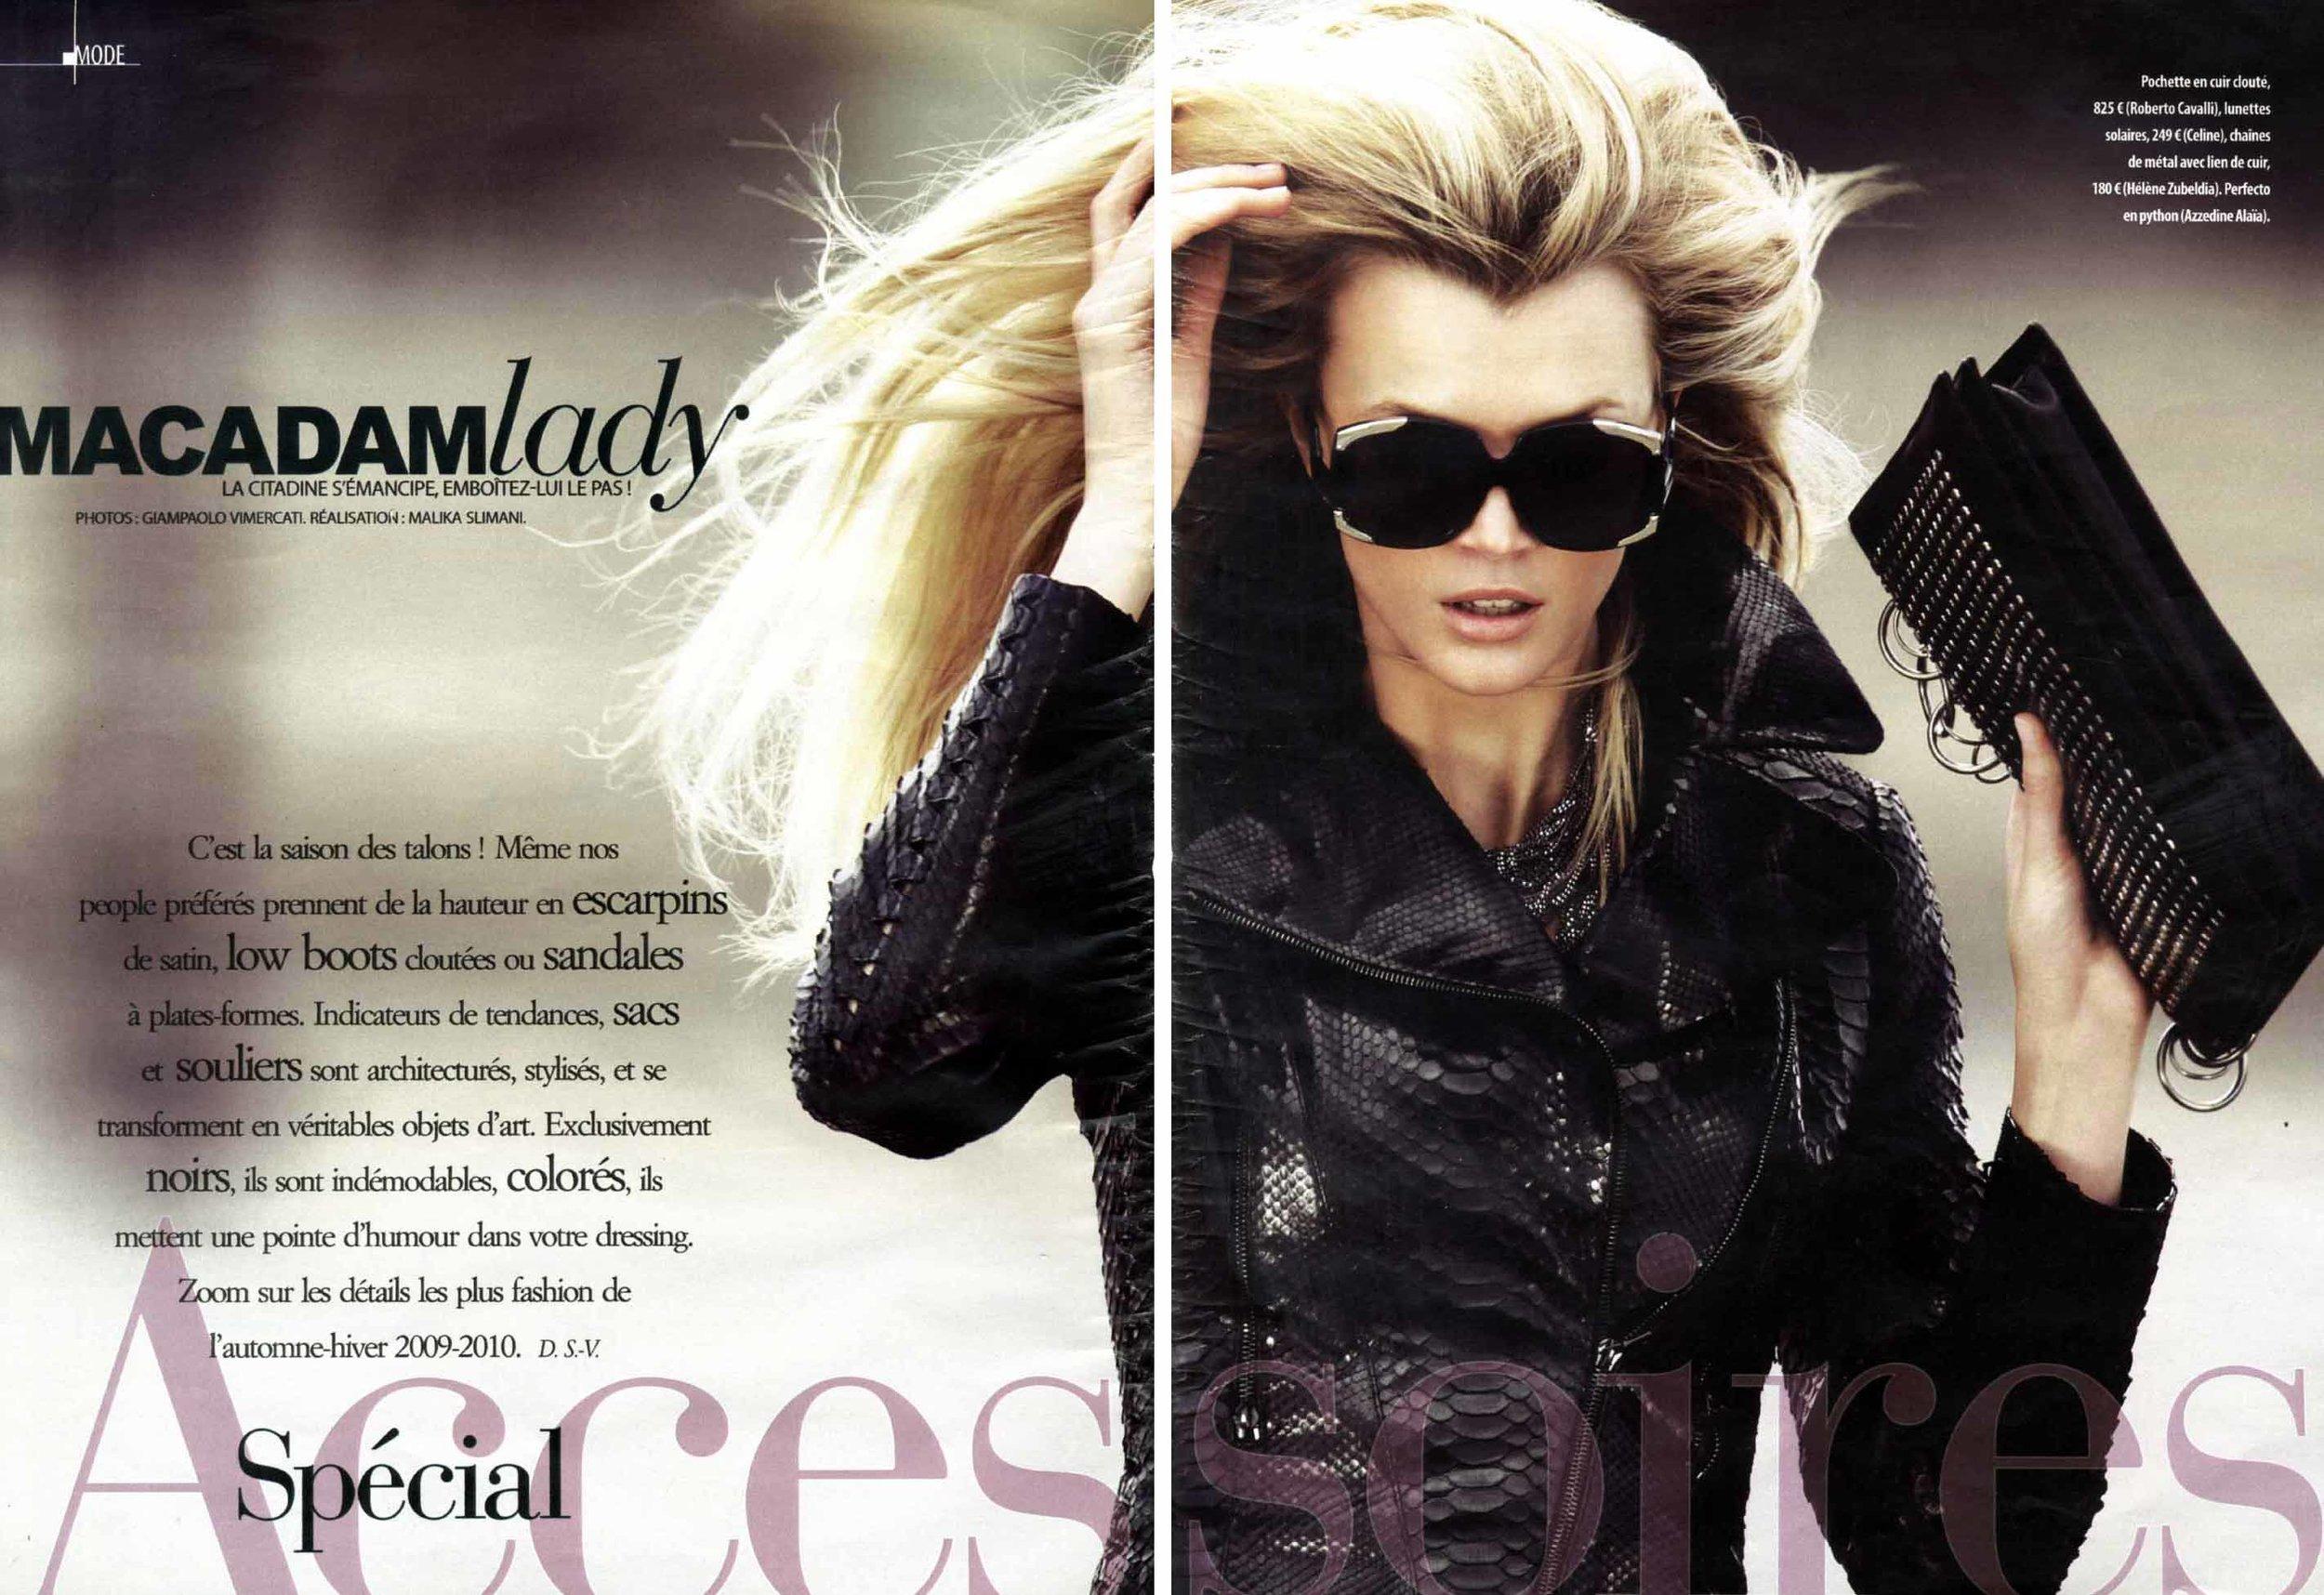 A Mode Magazine Paris Model Jayne Moore writer Jayne moore amazing hair channel suit running through paris